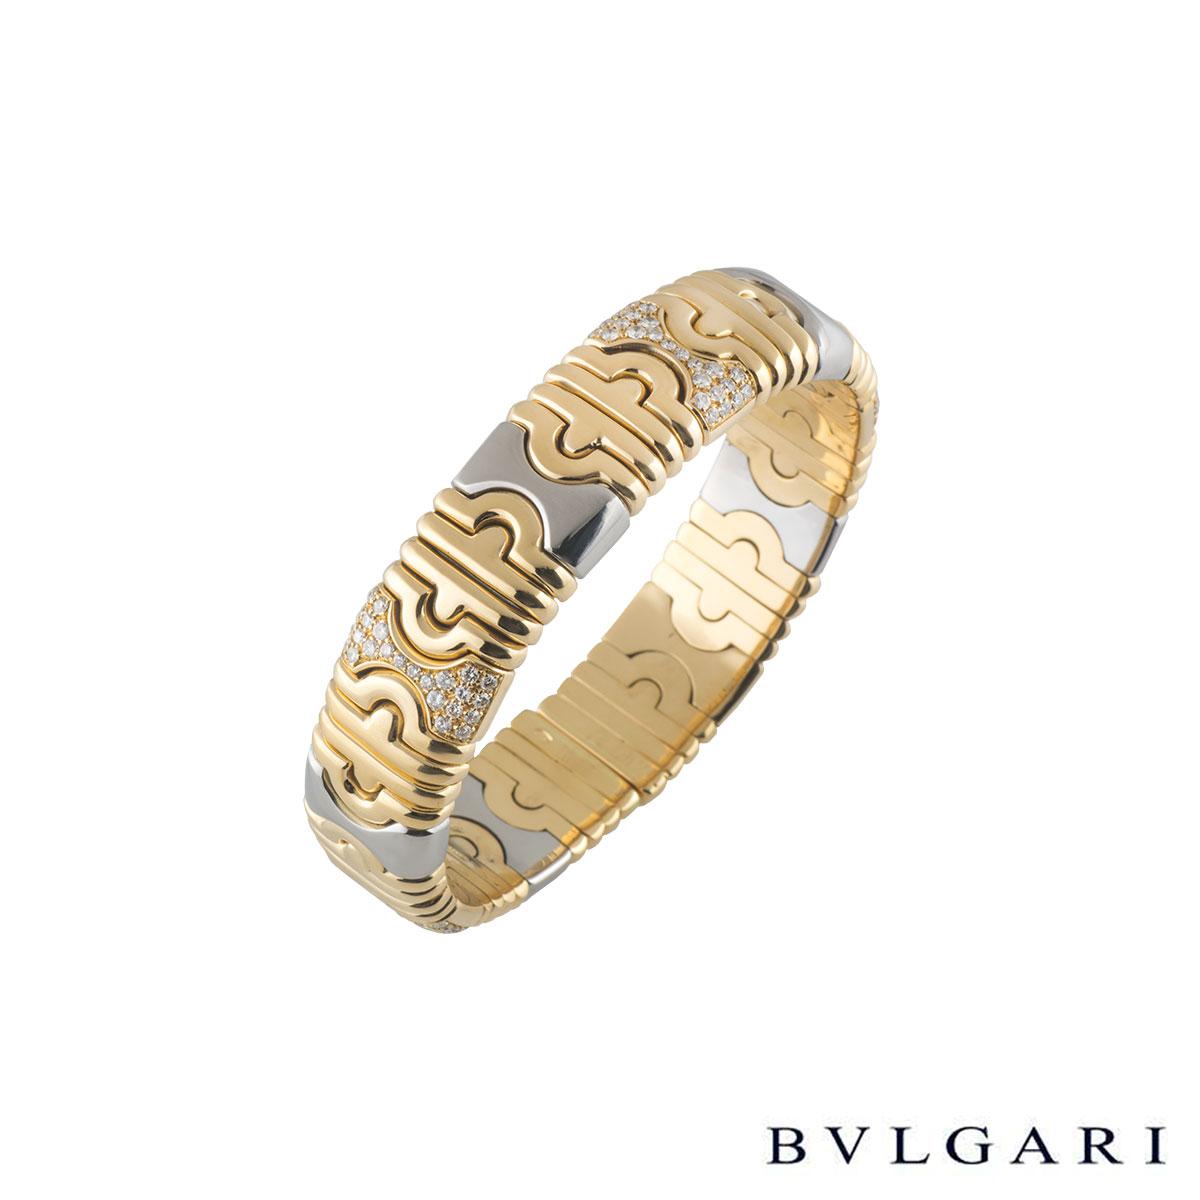 BvlgariYellow Gold and Stainless Steel Diamond Parentesi Bangle